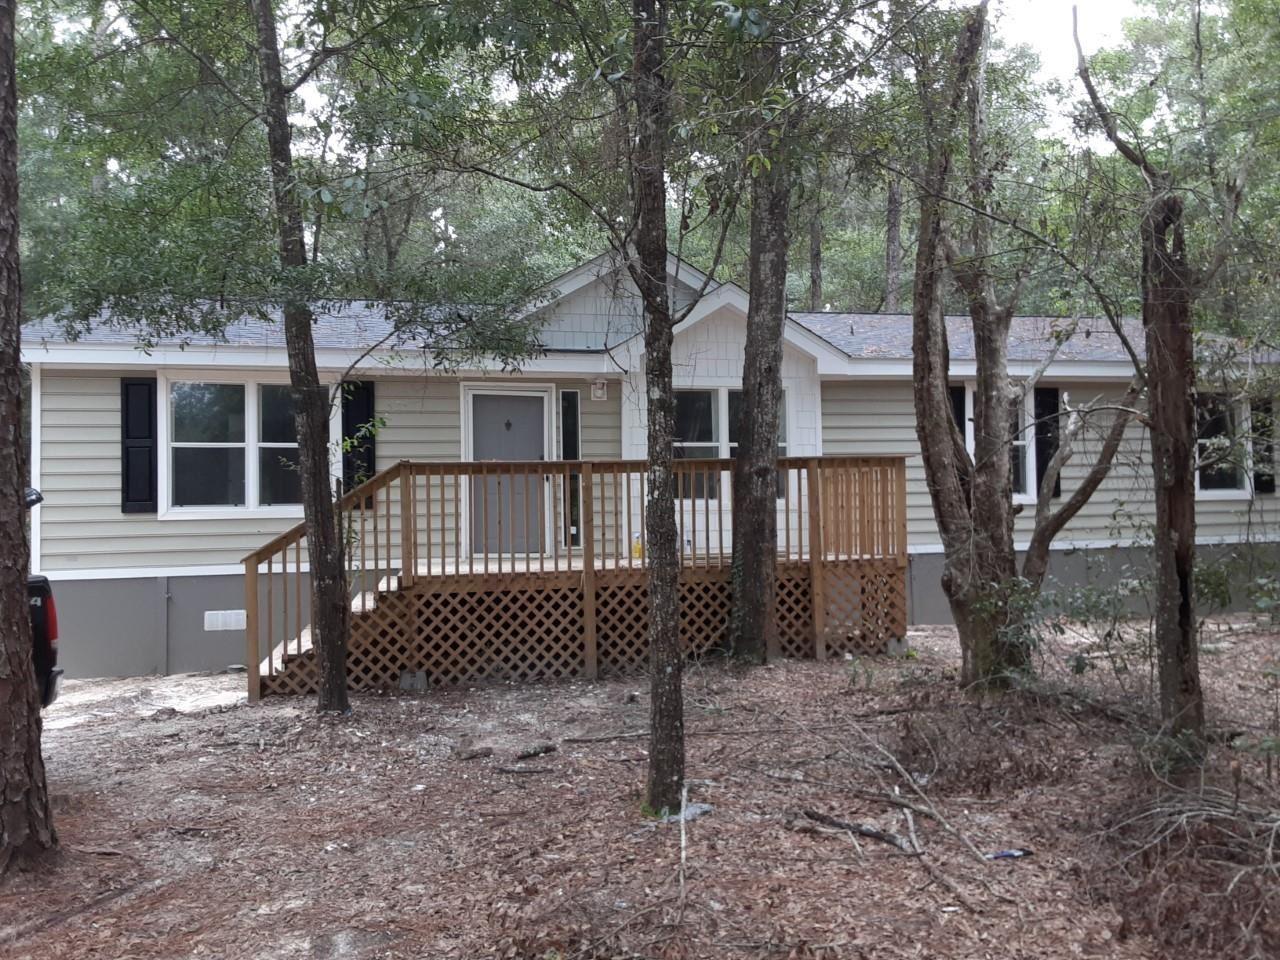 1427 Comanche Lane, Tallahassee, FL 32304 - MLS#: 337367